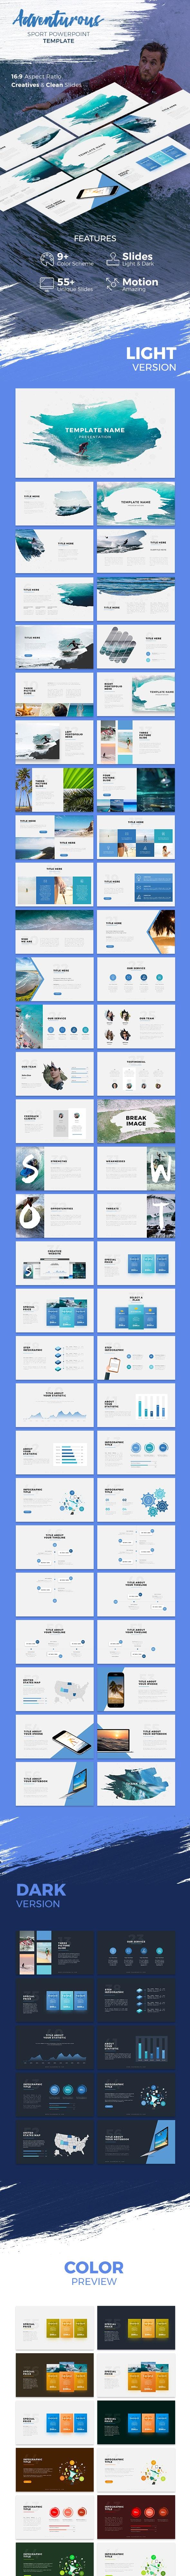 Adventurous - Brush Powerpoint Template - Creative PowerPoint Templates